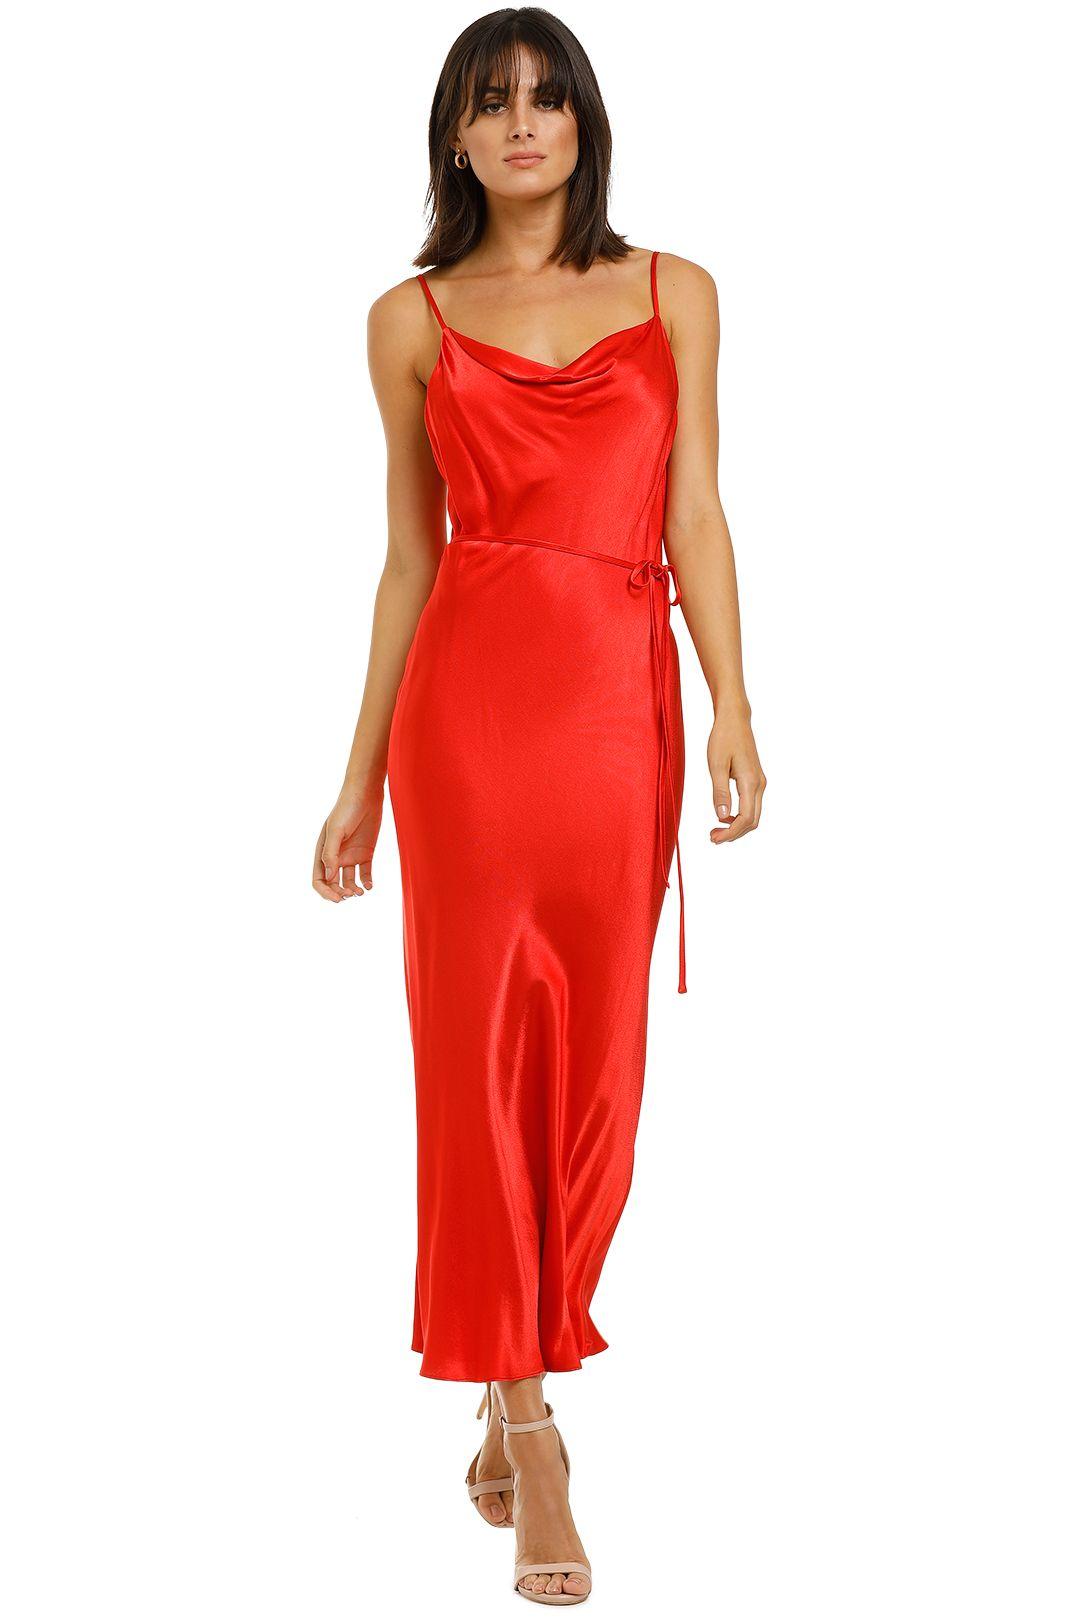 Shona-Joy-Bias-Slip-Dress-Red-Front